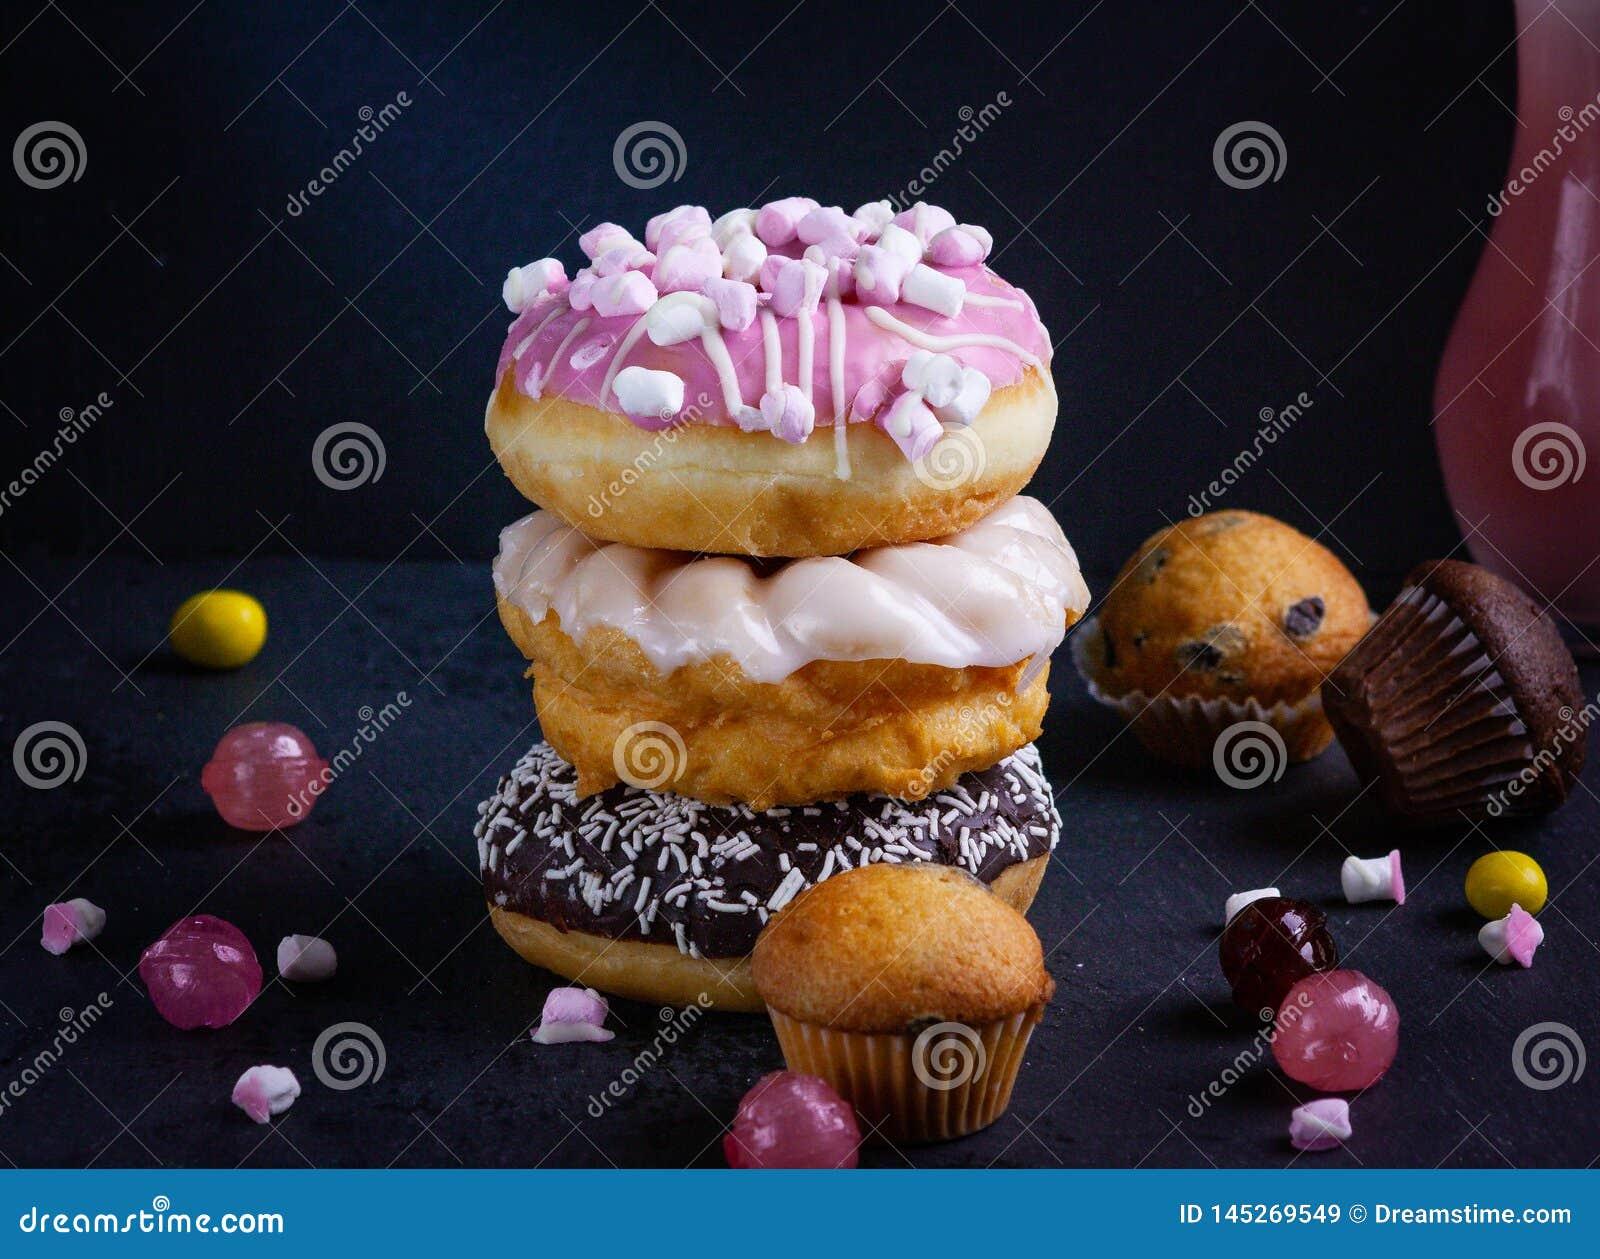 Donuts tower on dark background.